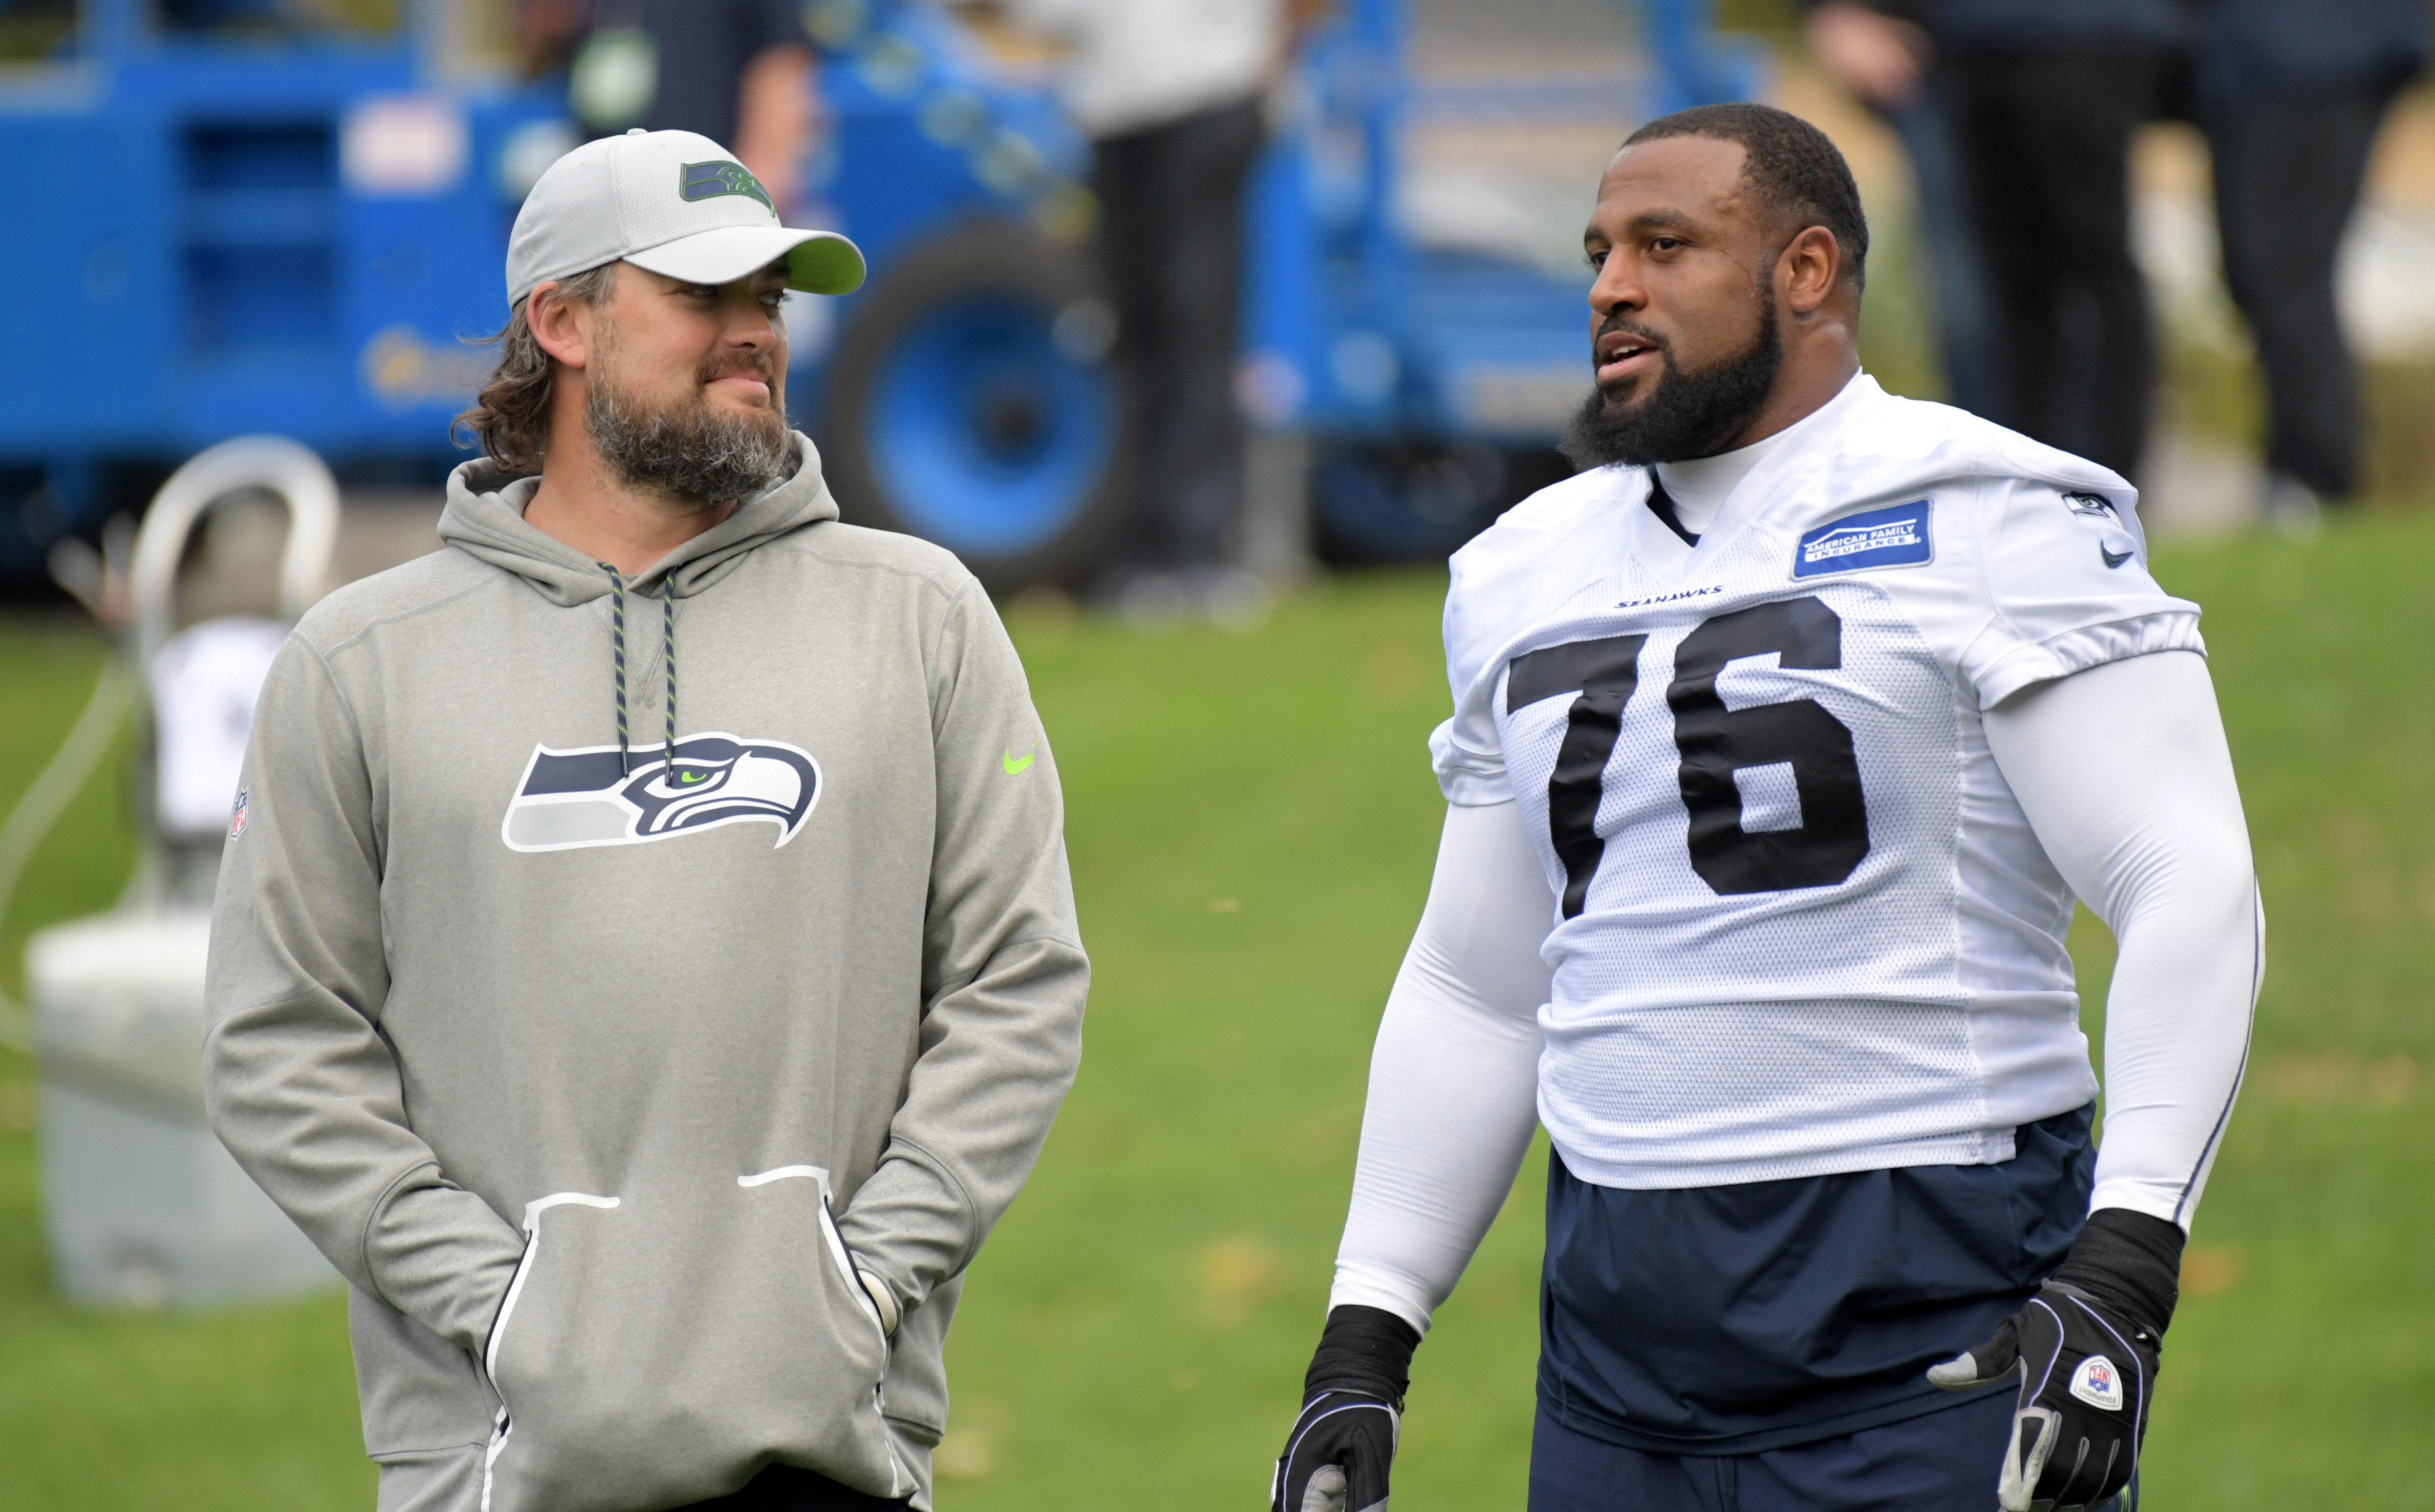 Report: Seahawks Assistant OL Coach Brennan Carroll Linked to Hawaii